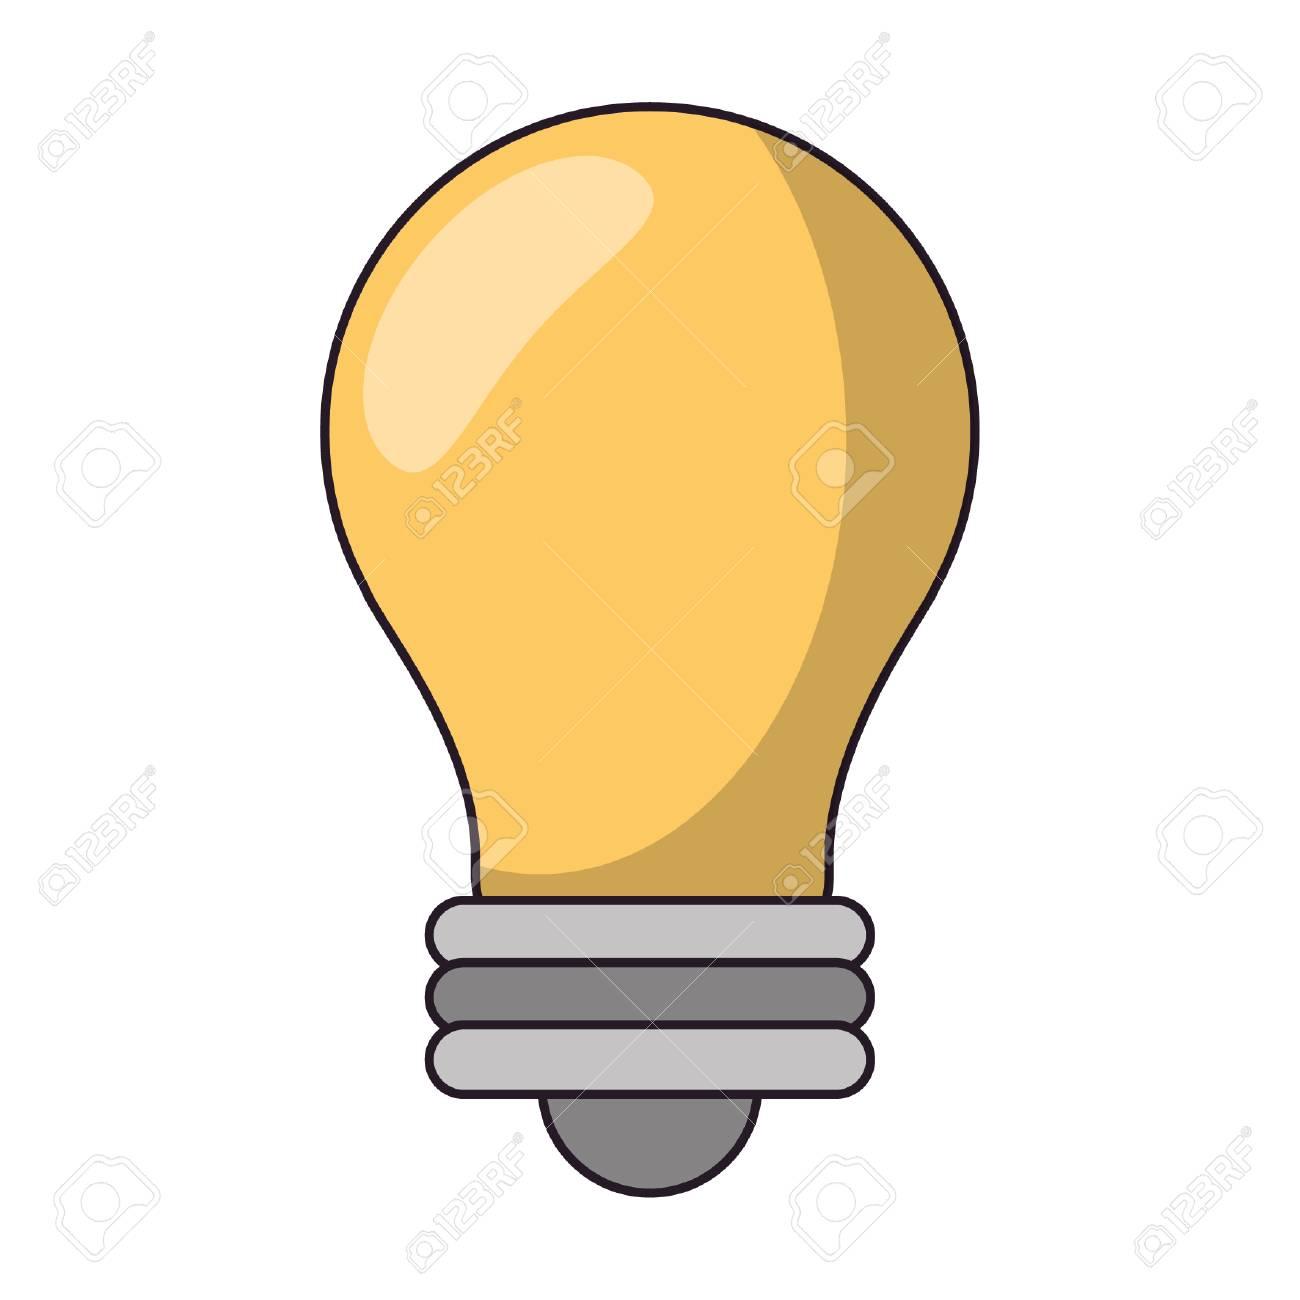 Bulb light symbol isolated vector illustration graphic design - 122549926